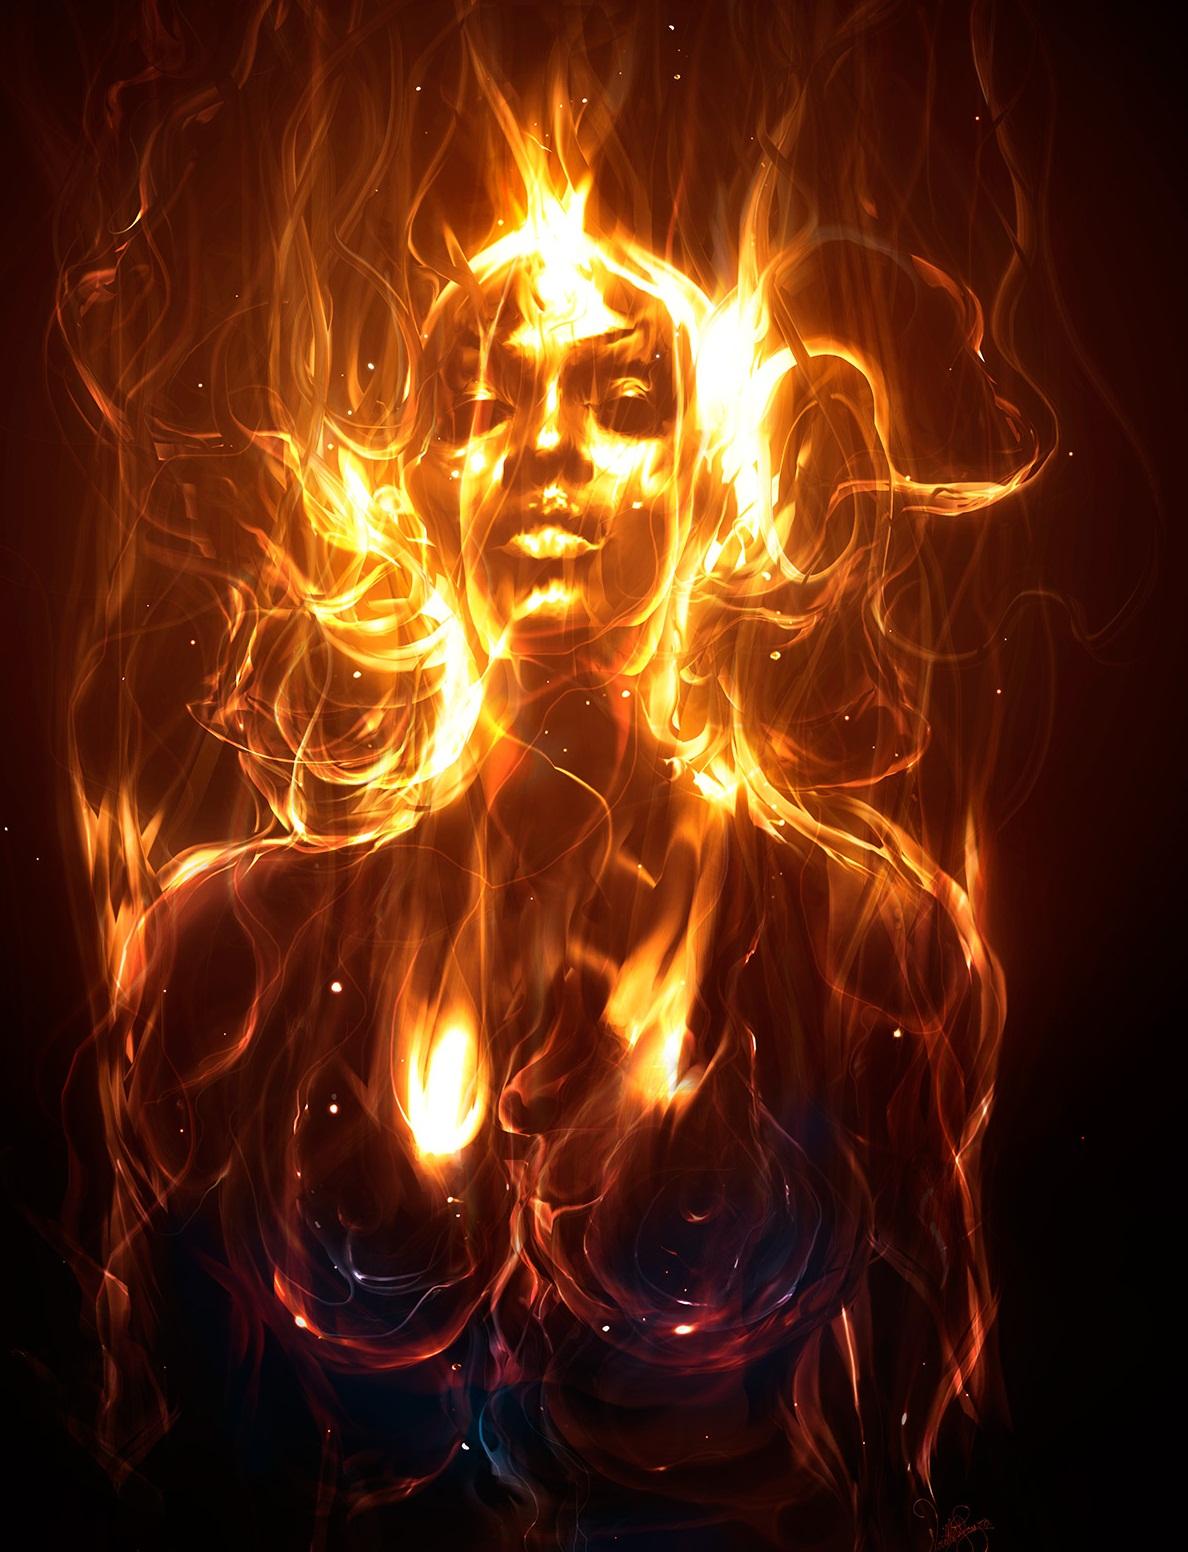 http://3.bp.blogspot.com/-1QlDYxWovPs/UPL3VKMGa6I/AAAAAAAAV6c/LrcCCaCI8iY/s1600/Neville+Dsouza+fire+lady+5+stars+phistars+wallpaper+burning+cool+firestarter.jpg